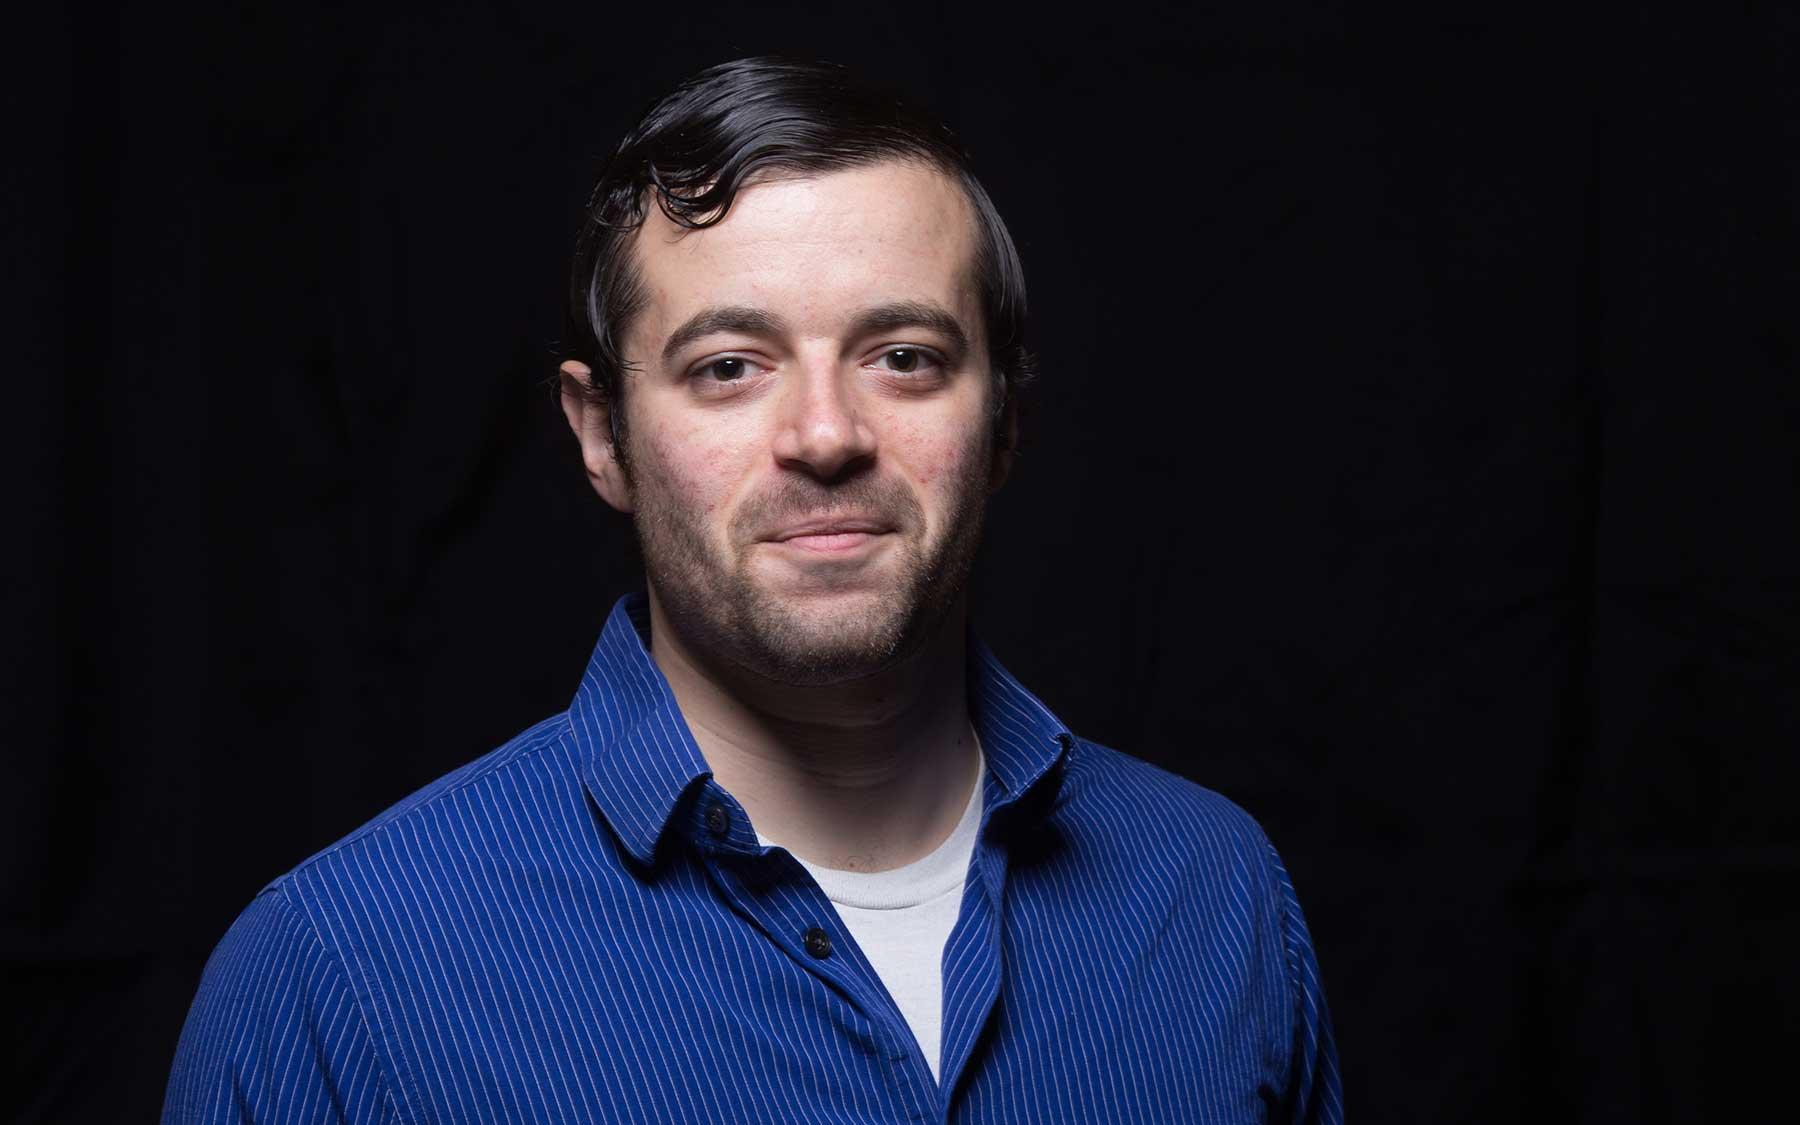 Josh Sanders